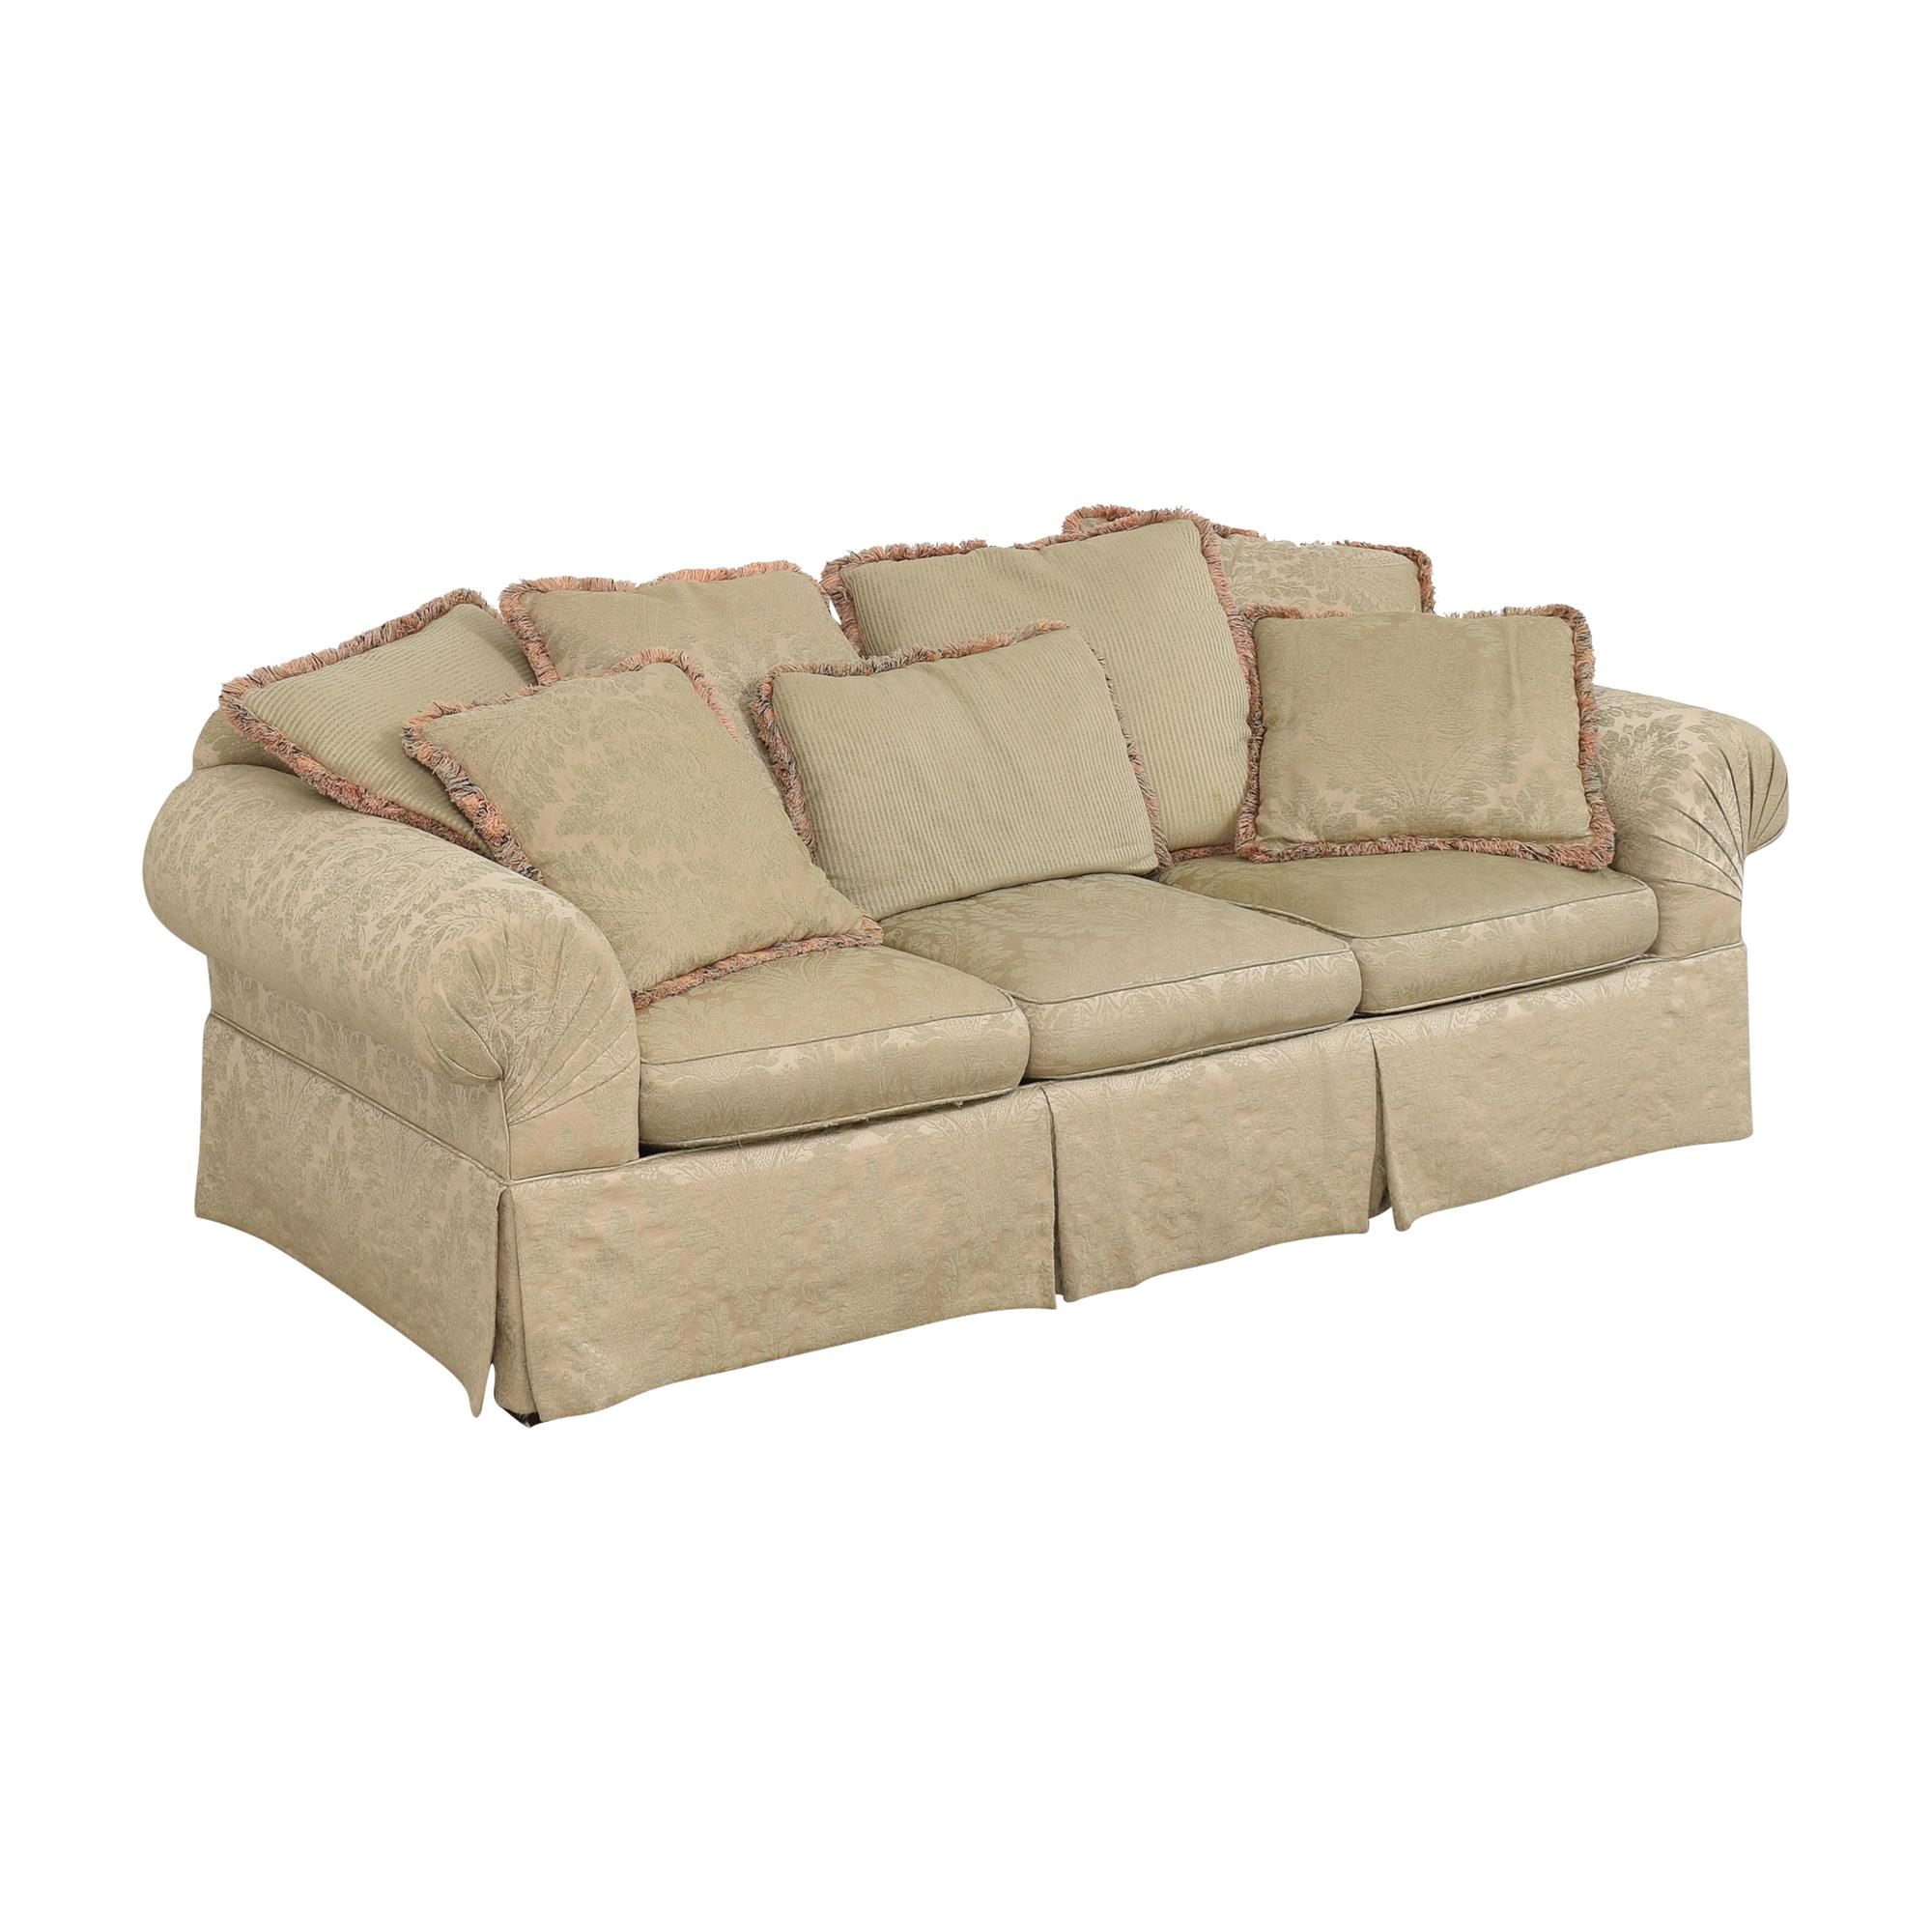 Lexington Furniture Lexington Furniture Skirted Roll Arm Sofa nj